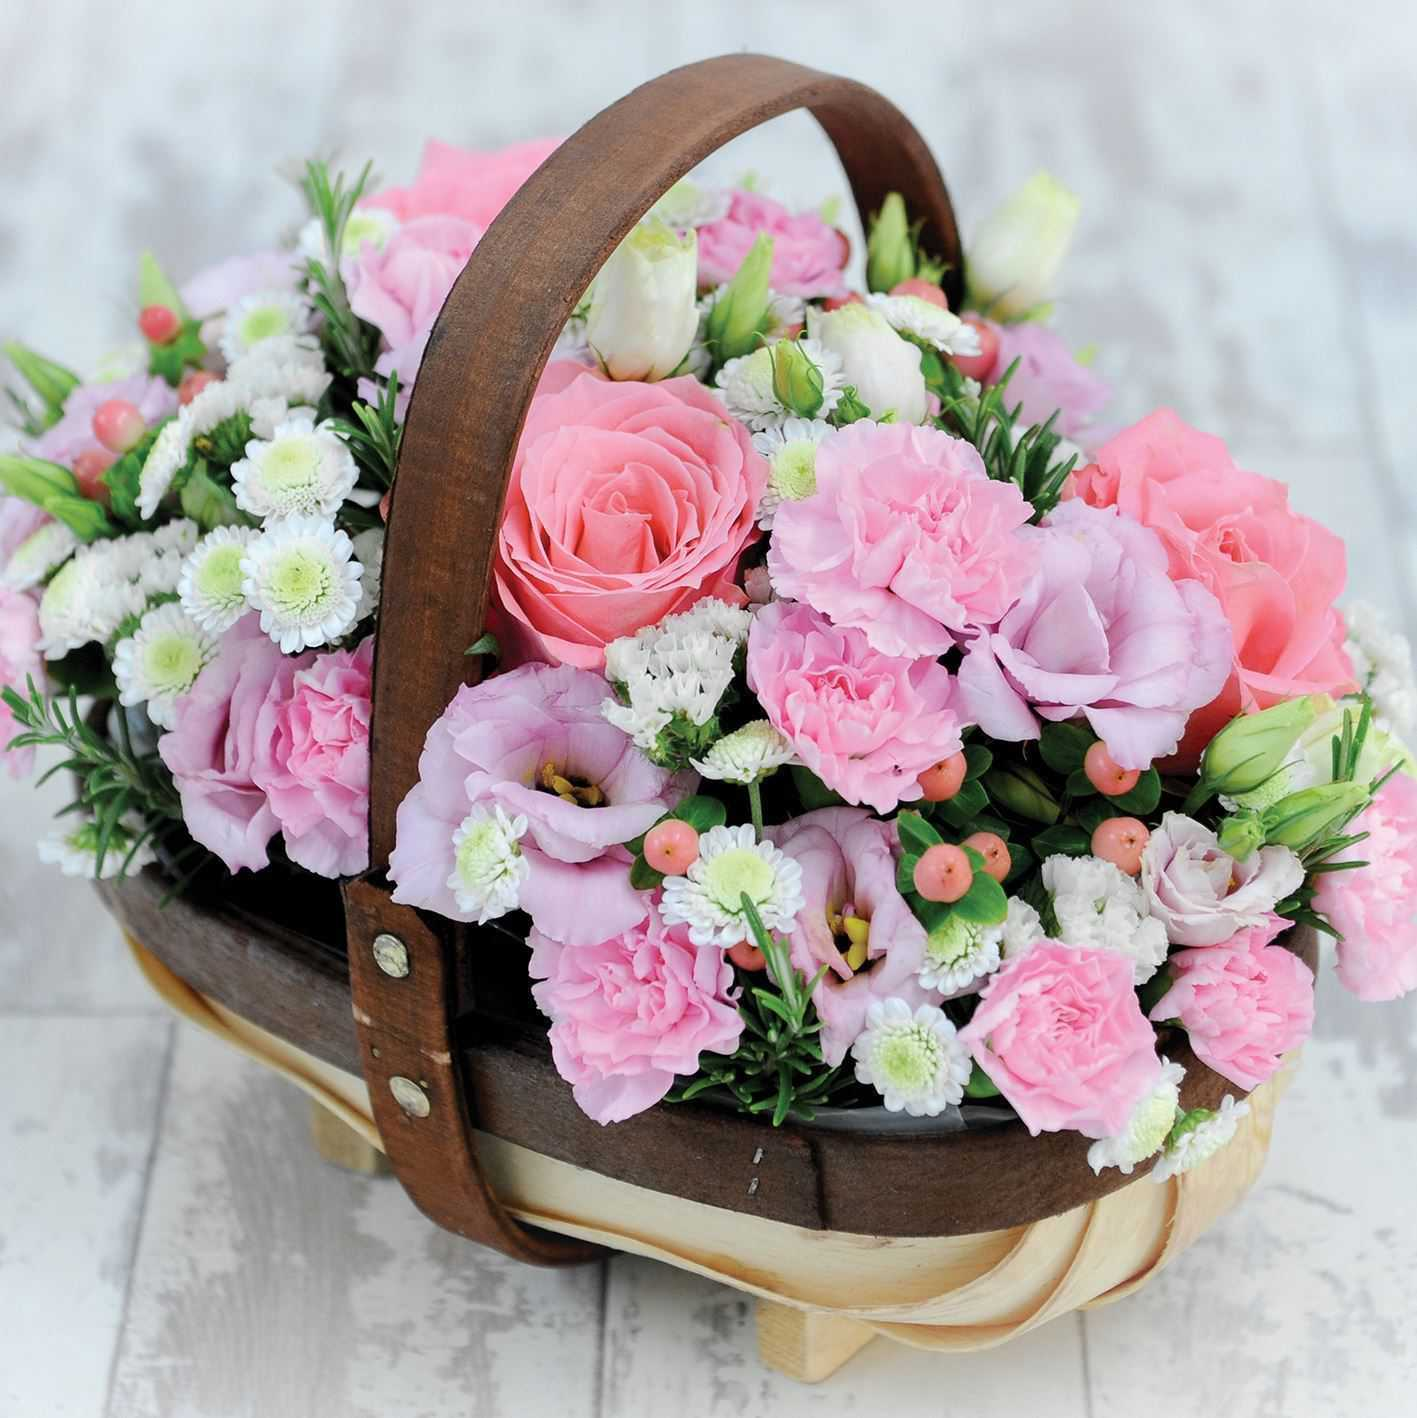 lẵng hoa sinh nhật đẹp nhất 1